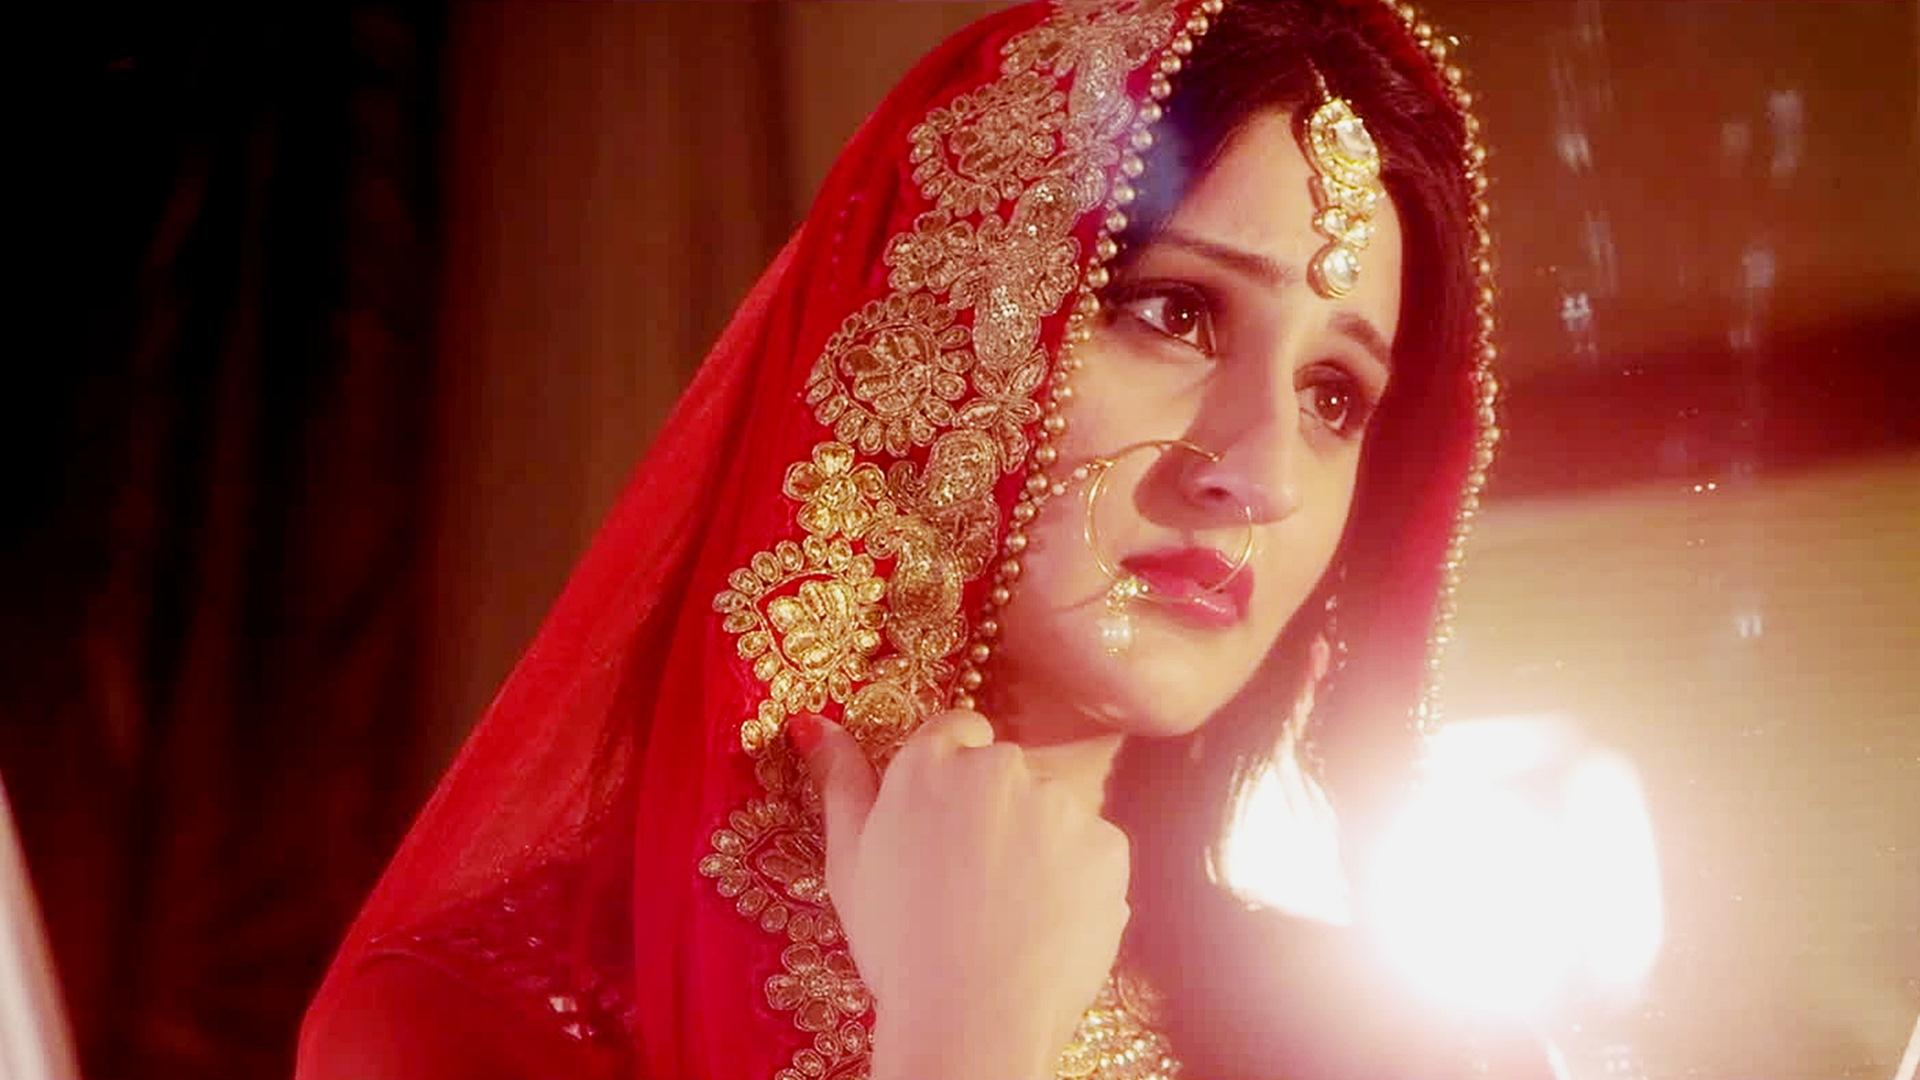 c0265e82ccc6 Cute Indian Bride Girl Wallpaper 13372 - Baltana